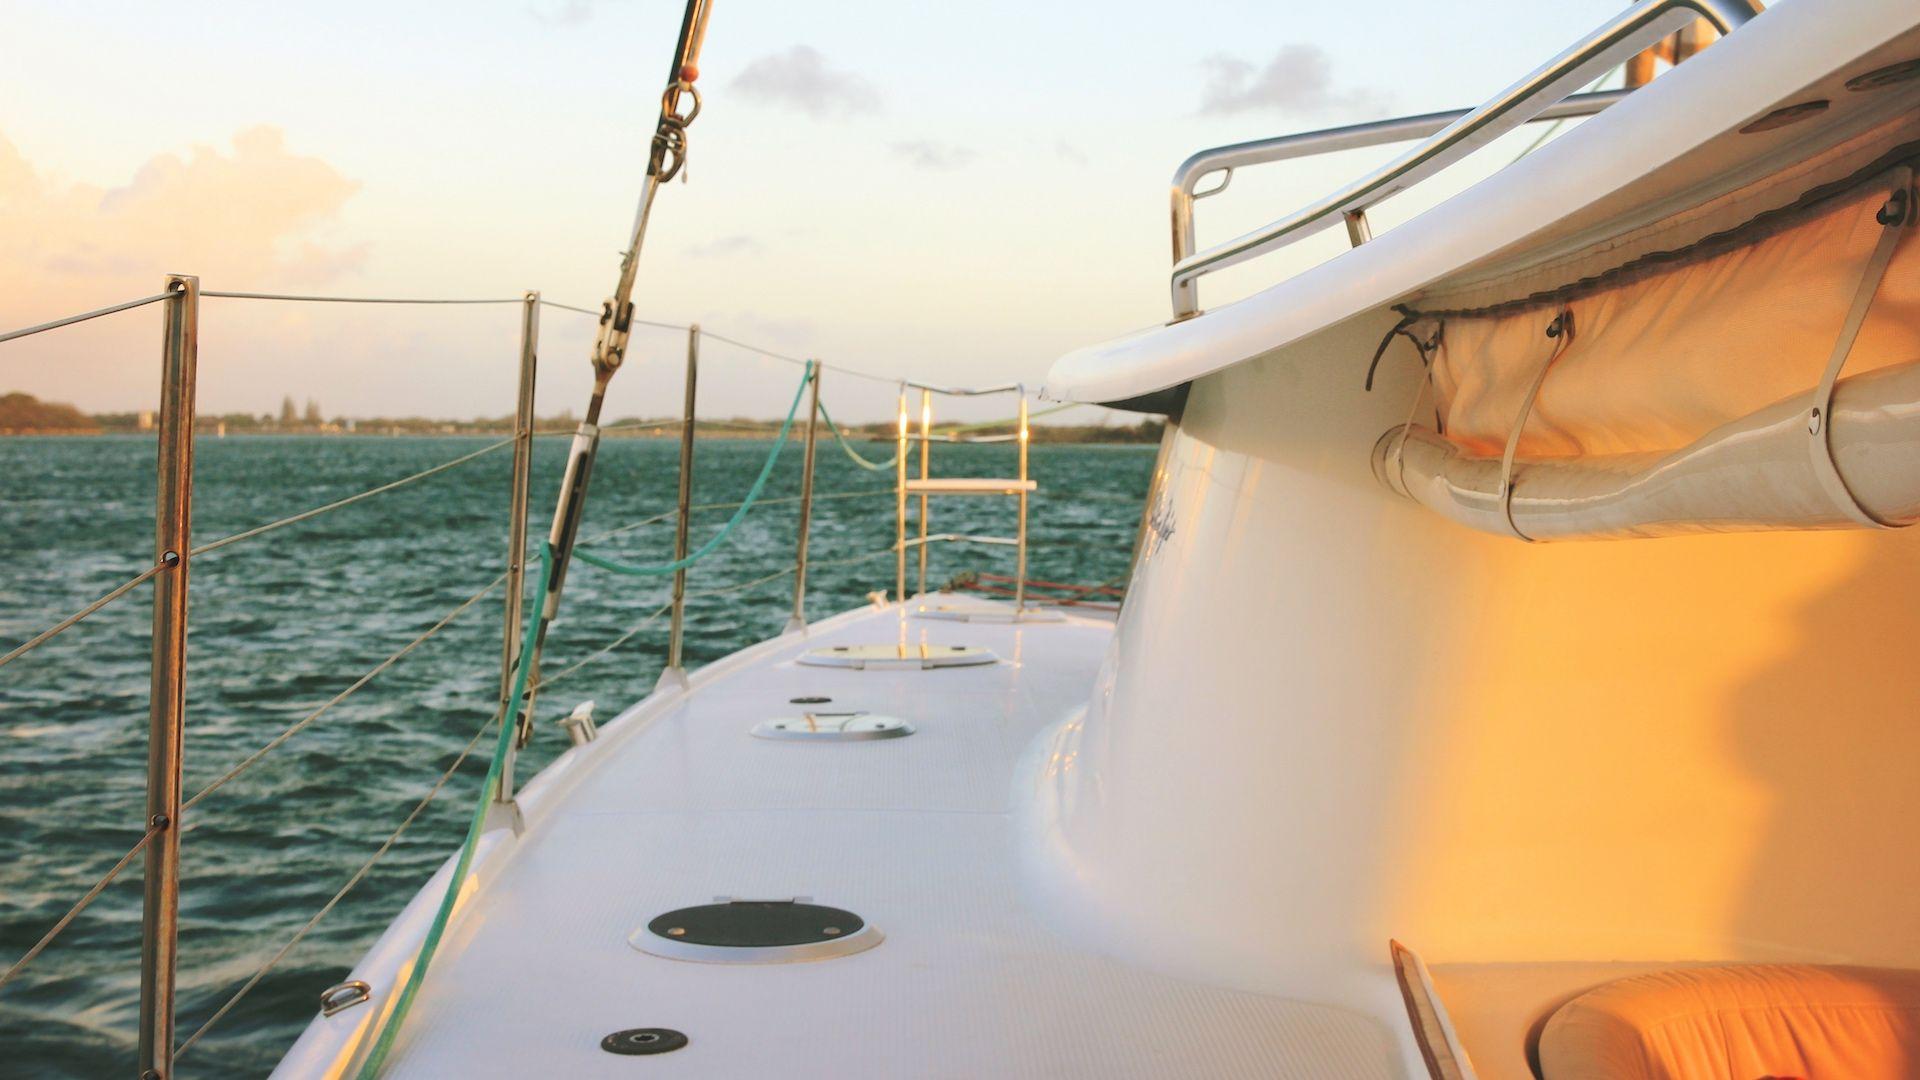 REVIEW Navegar en Gold Coast a bordo del velero de lujo Indigo: imperdible